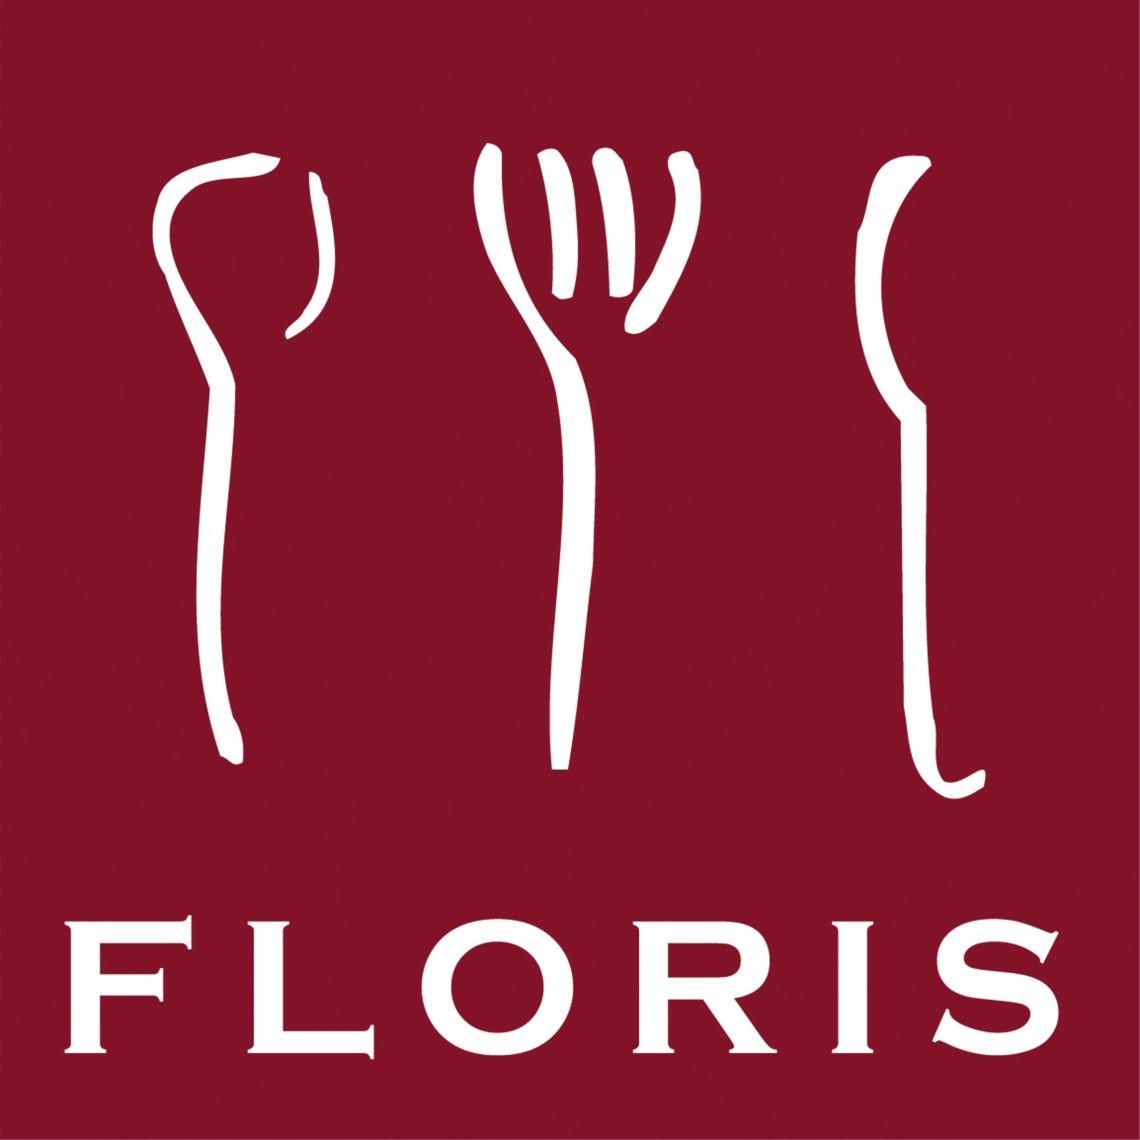 FLORIS Catering ist Preisträger des Food & Drink Award und des German Business Award 2018